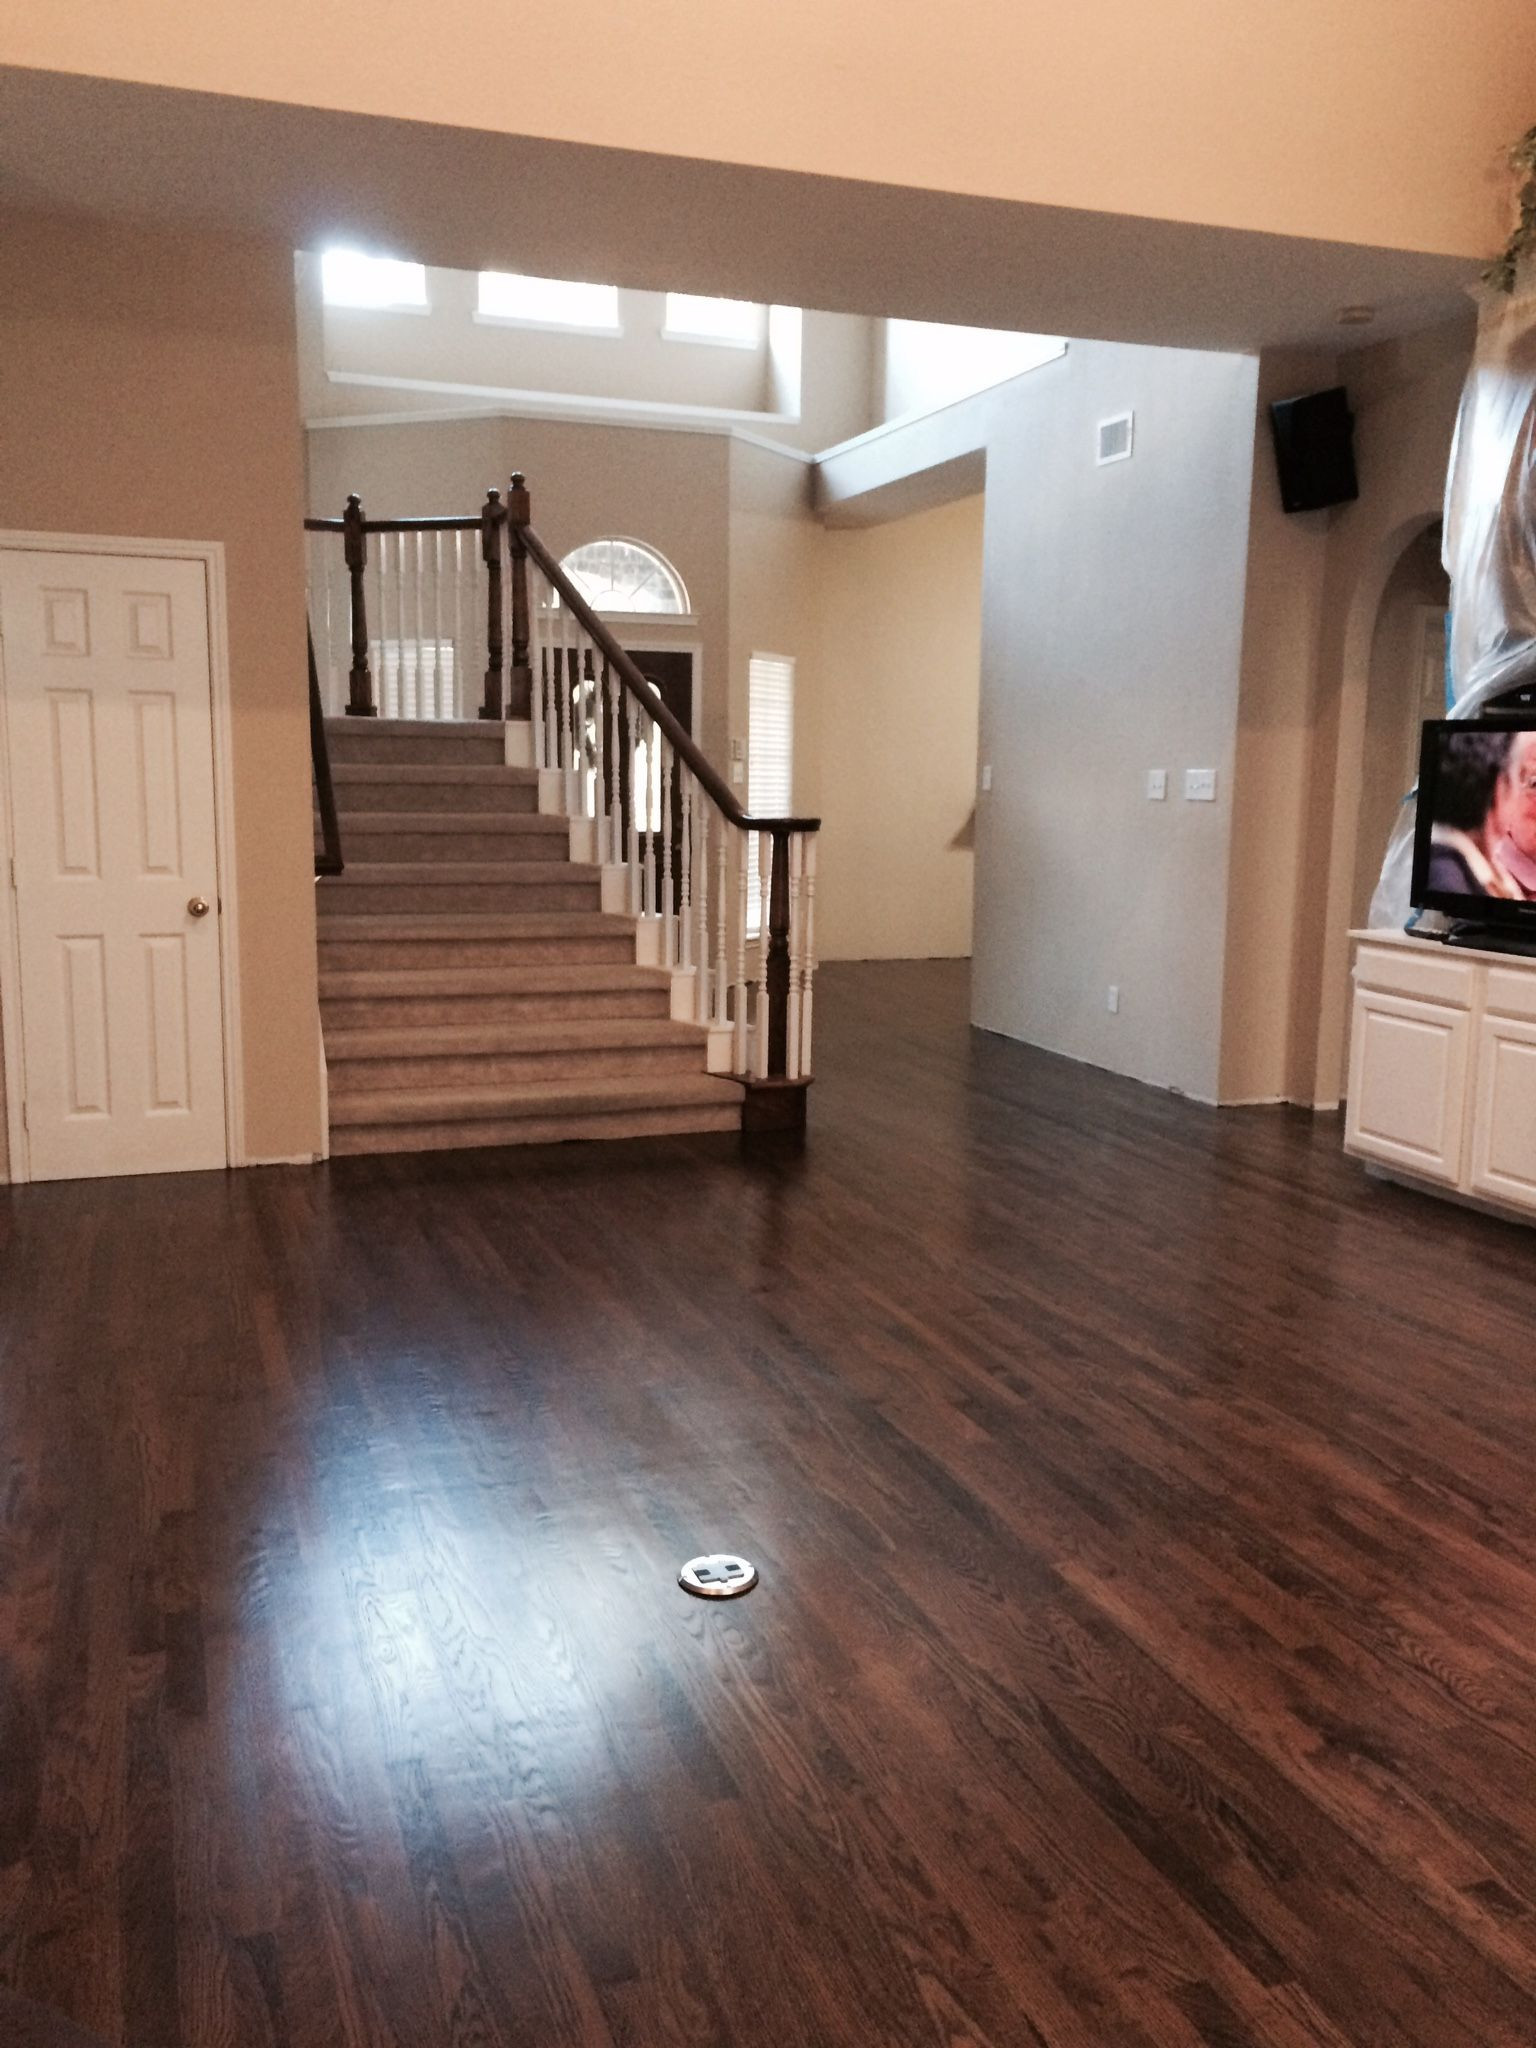 white oak hardwood flooring prices of dark walnut stain on white oak hardwood remodel 1floors in 2018 throughout dark walnut stain on white oak hardwood walnut hardwood flooring hardwood floor stain colors